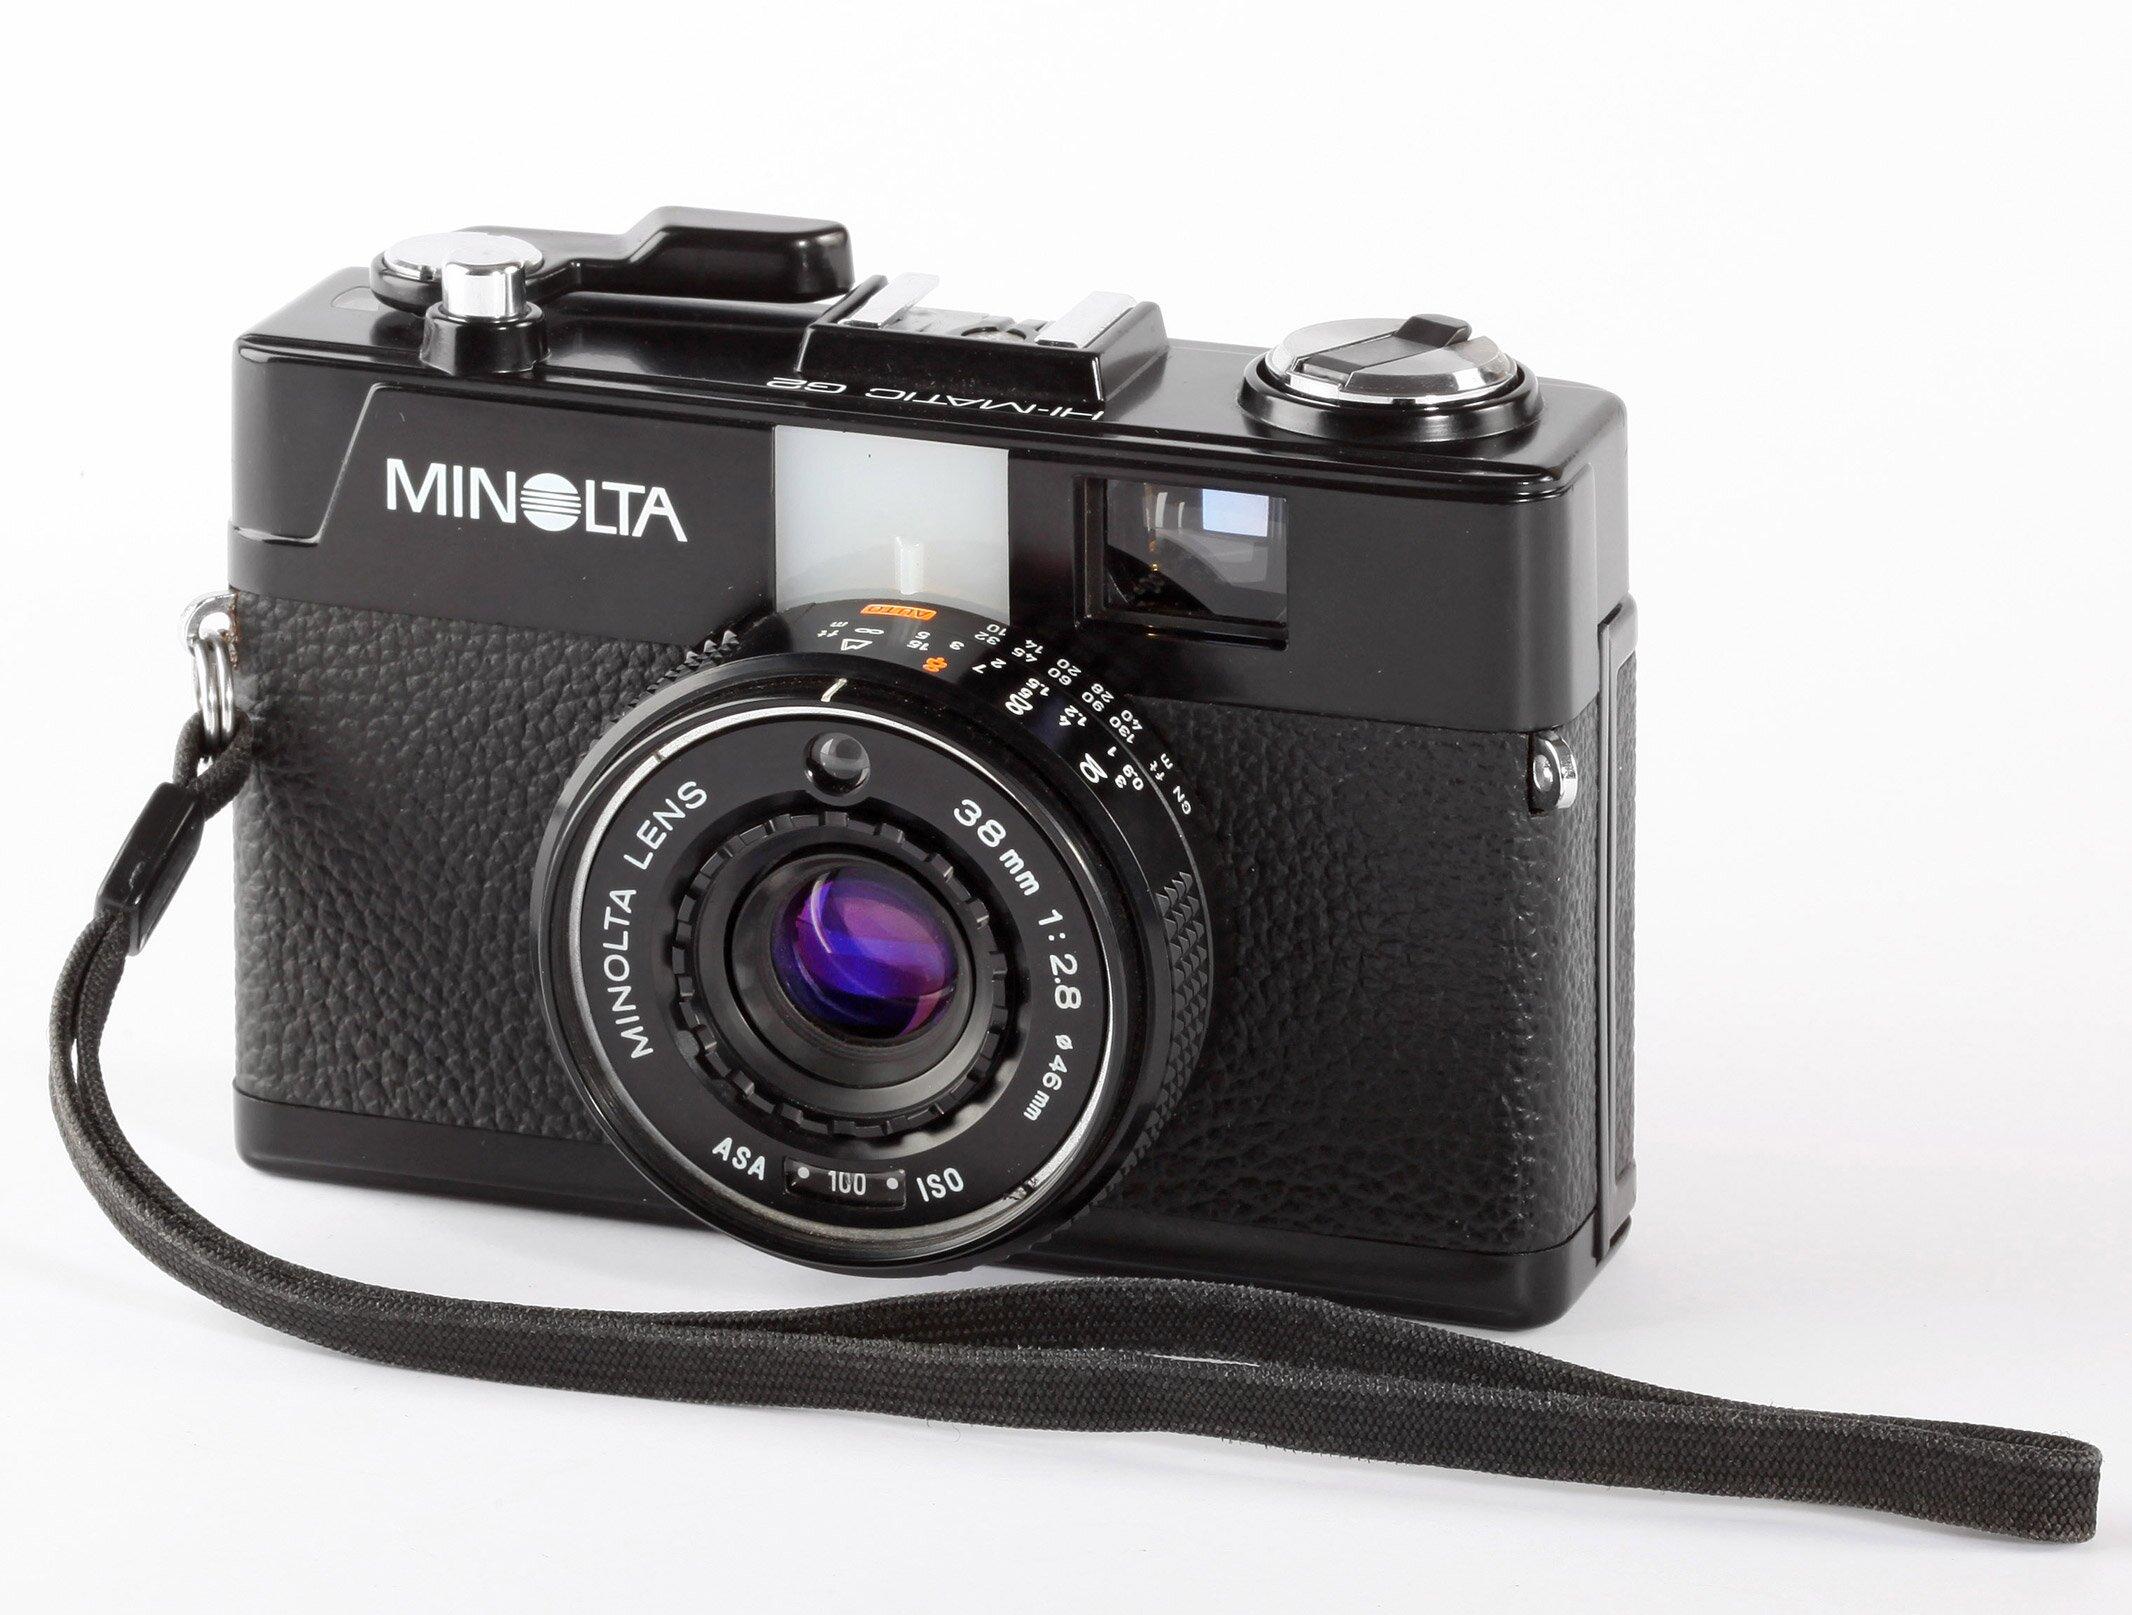 Minolta HI-Matic G2 Analoge Kompaktkamera